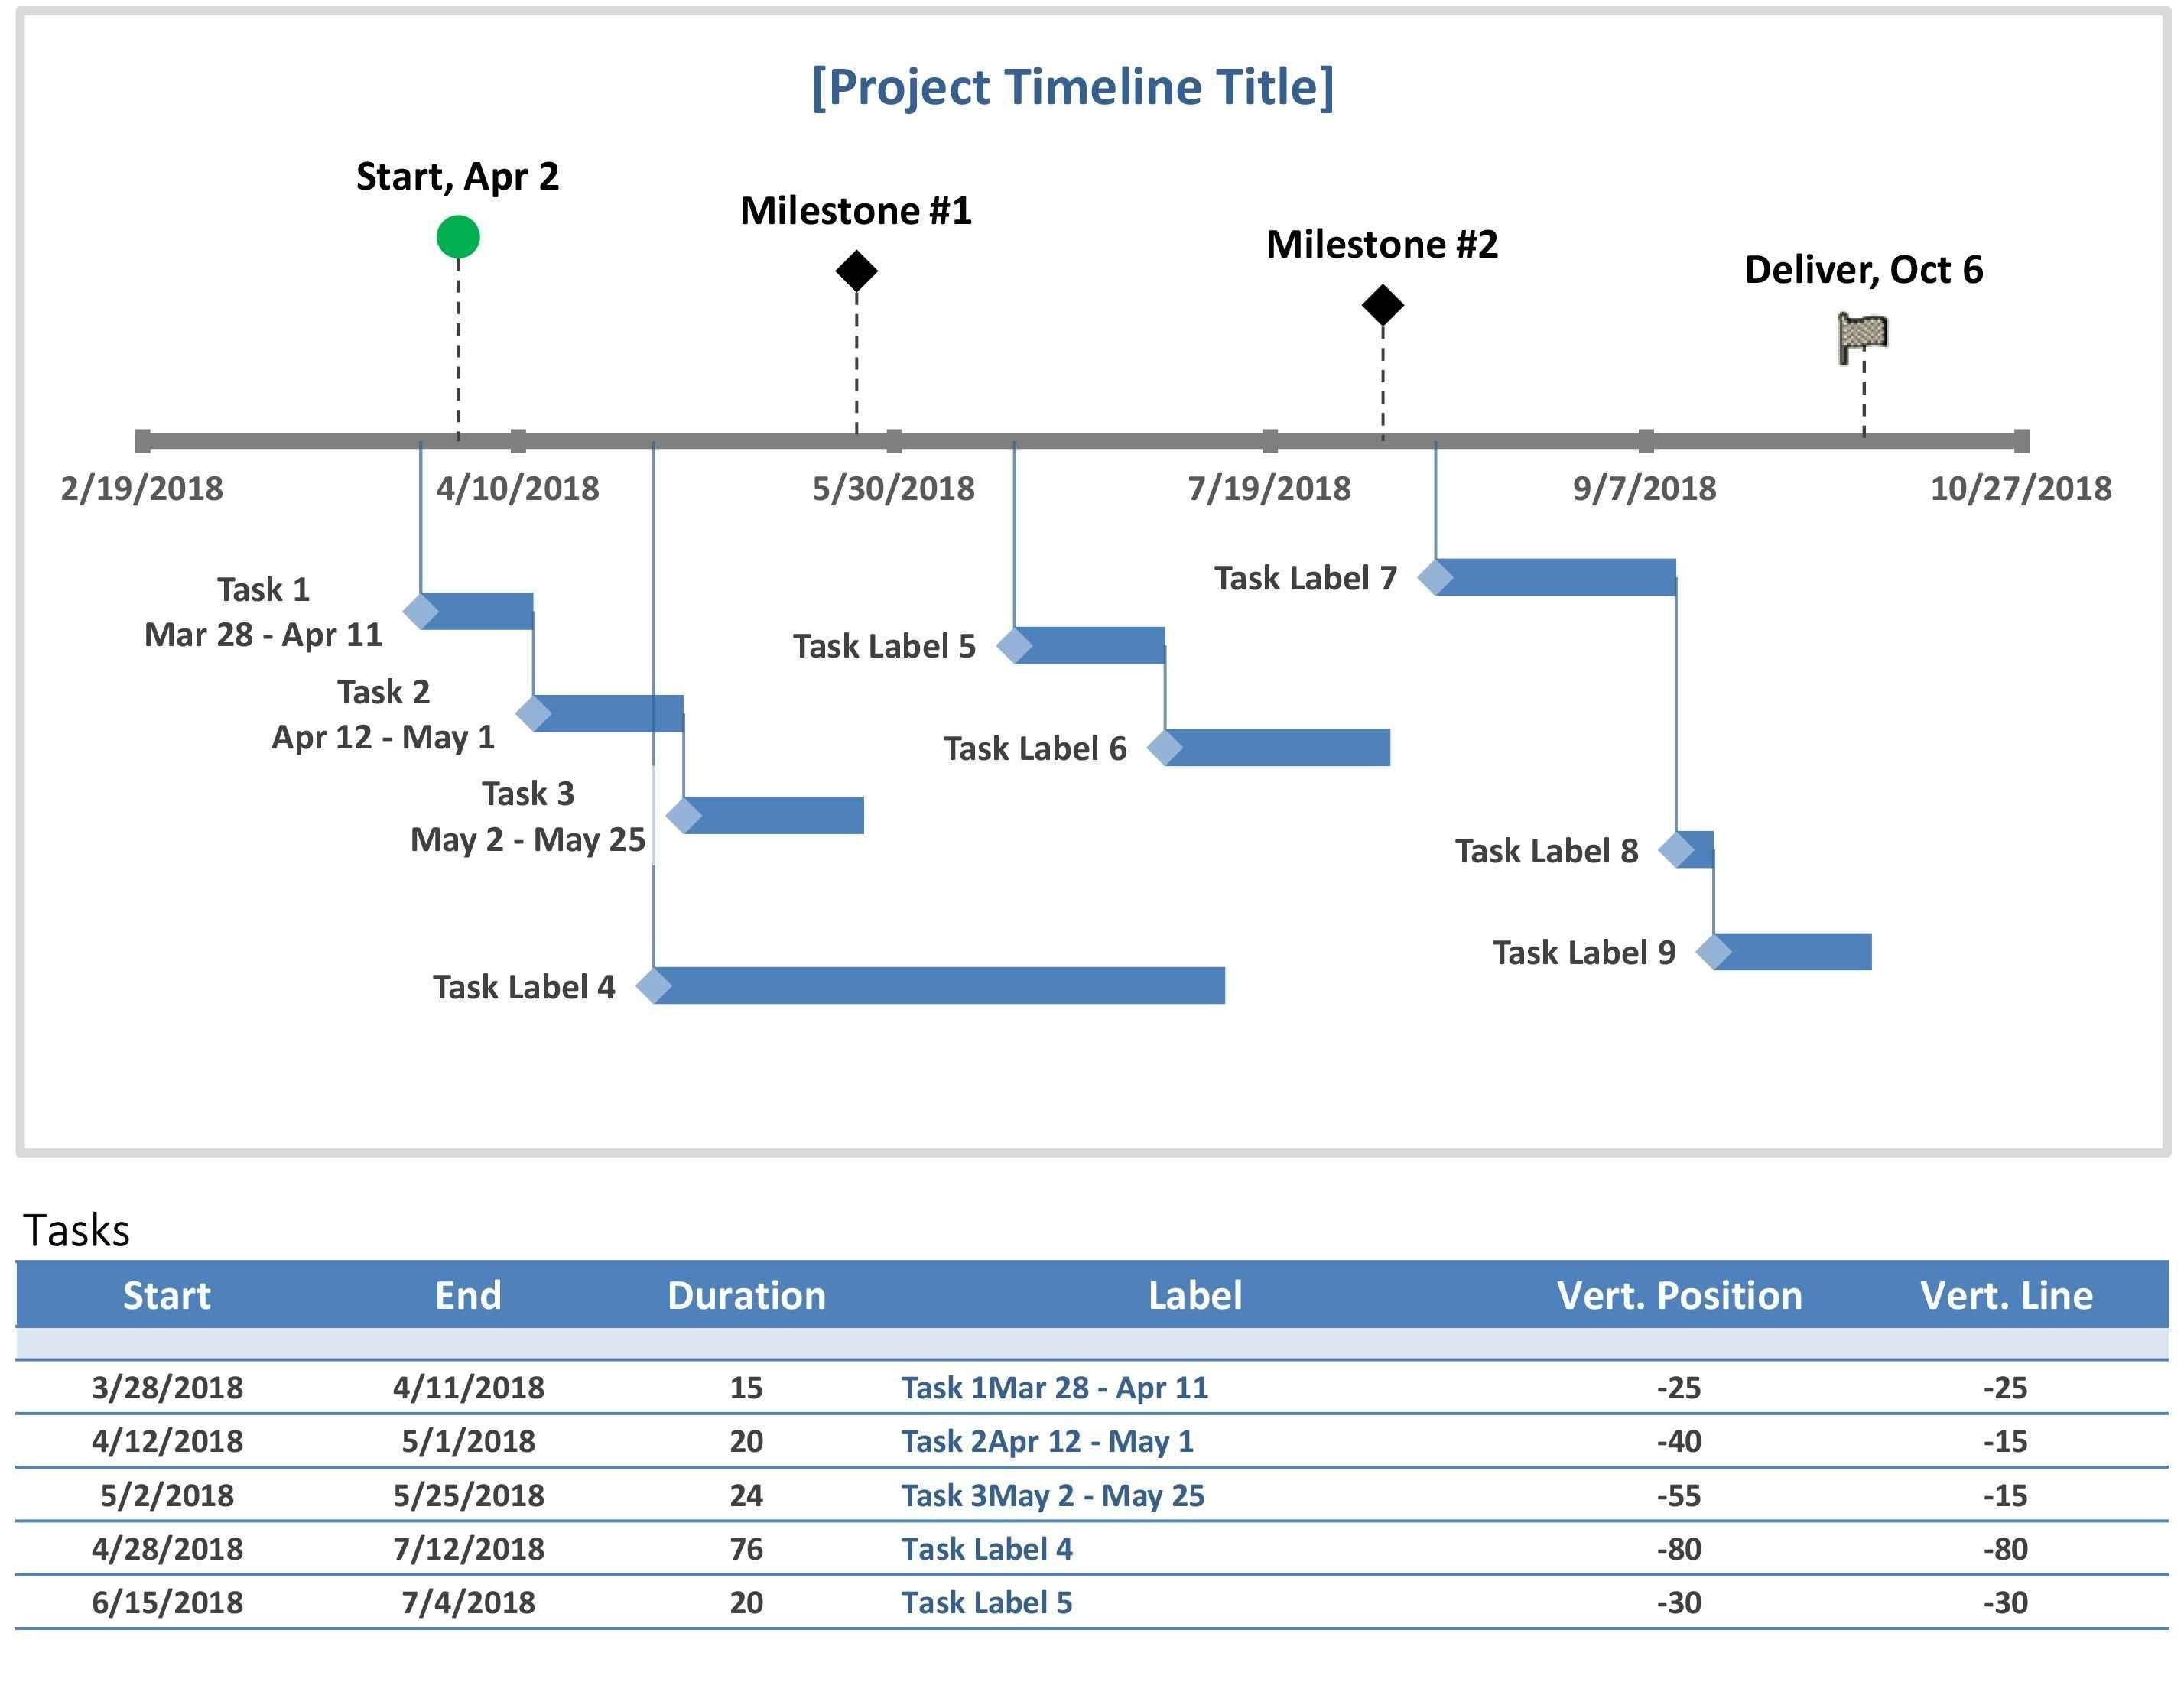 003 Unforgettable Project Management Timeline Template Design  Plan Pmbok PlannerFull